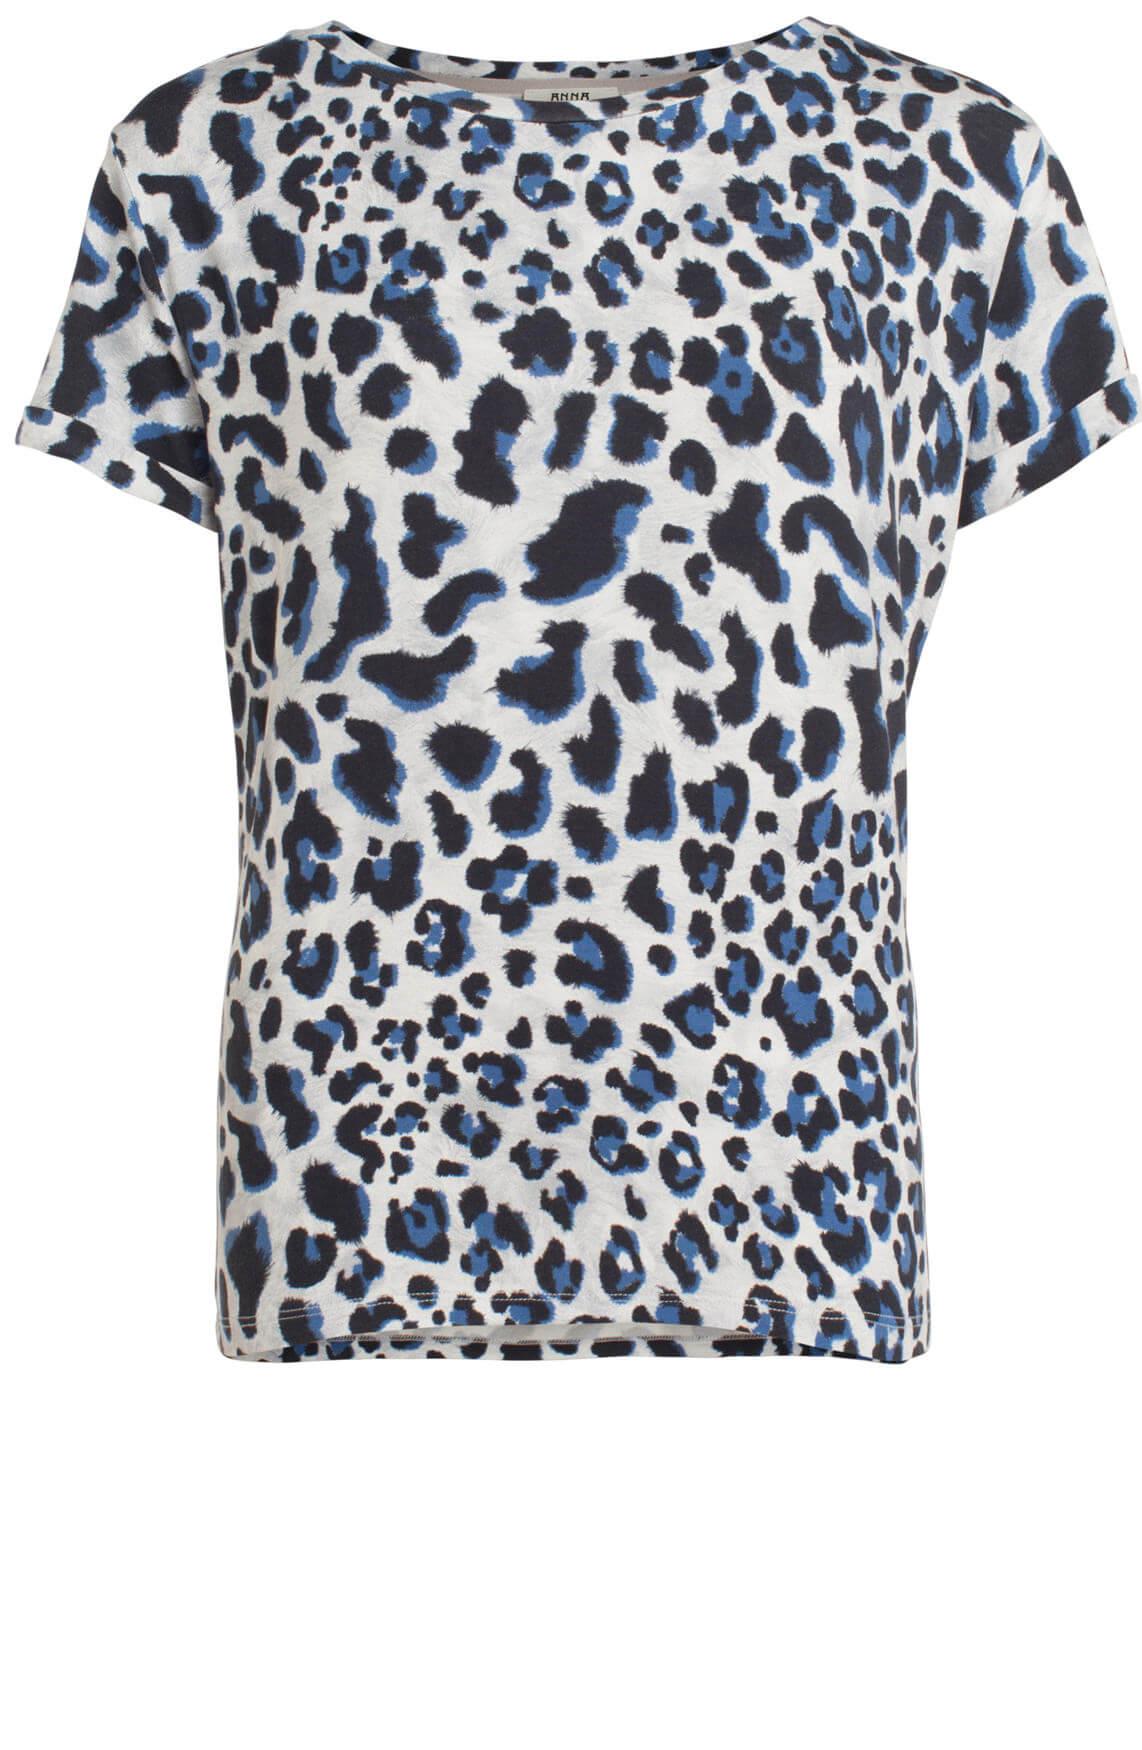 Anna Dames Panterprint shirt Grijs